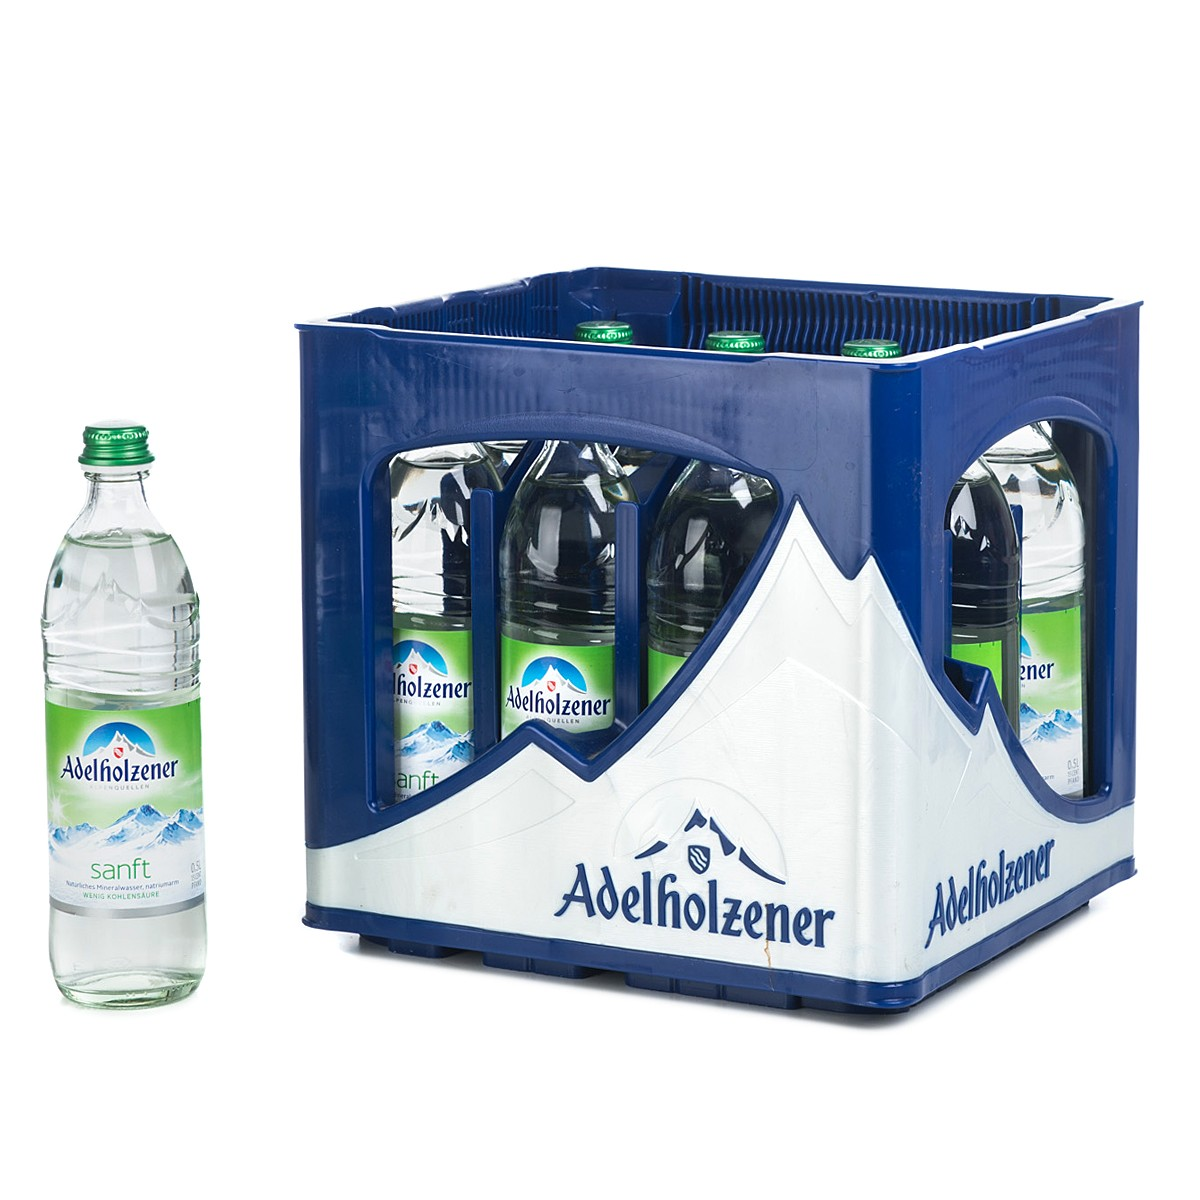 Adelholzener Sanft 12x0,5l Glas